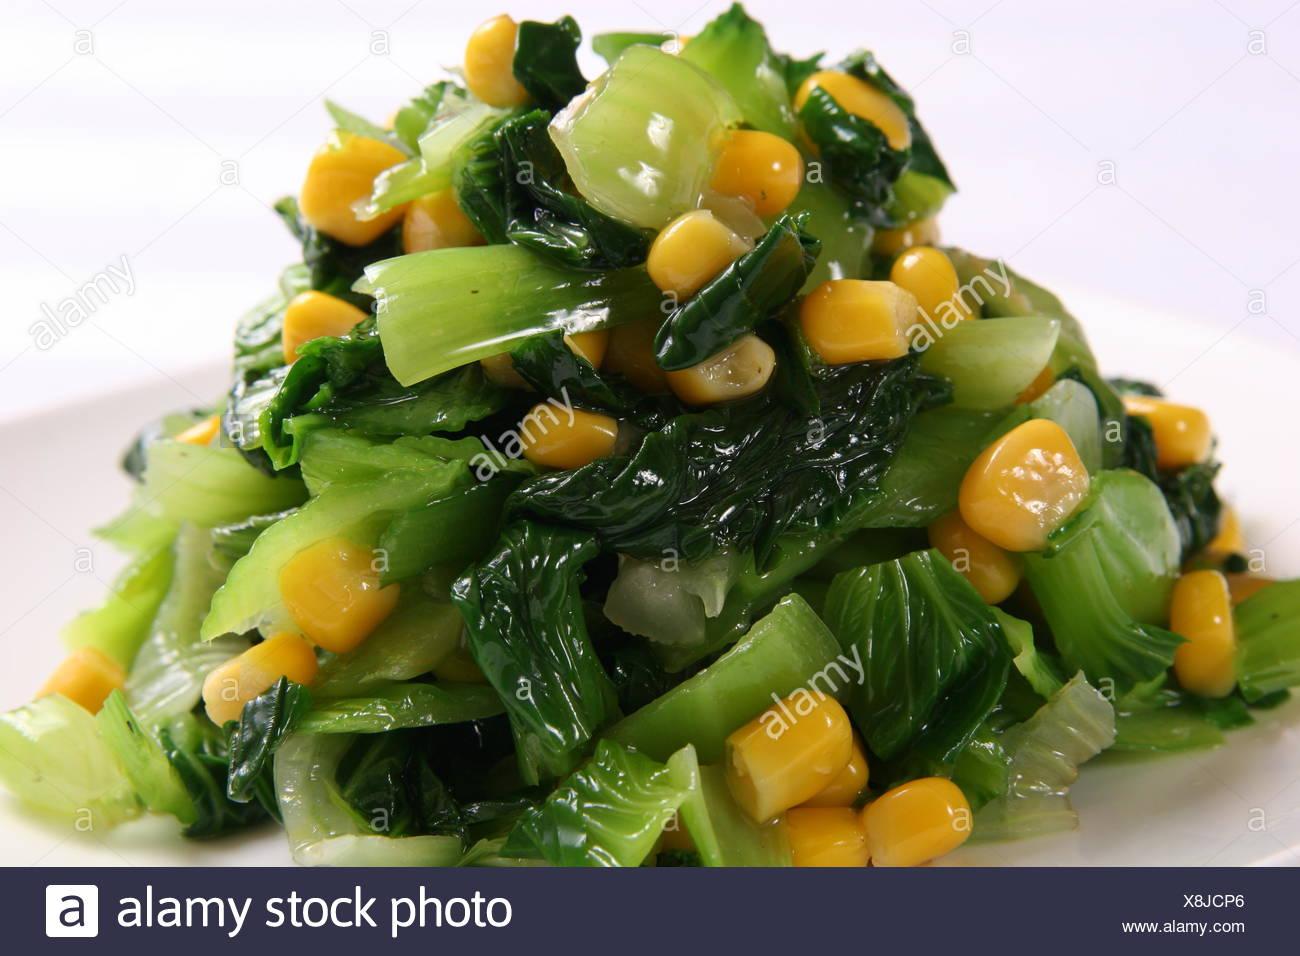 Corn greengrocery - Stock Image